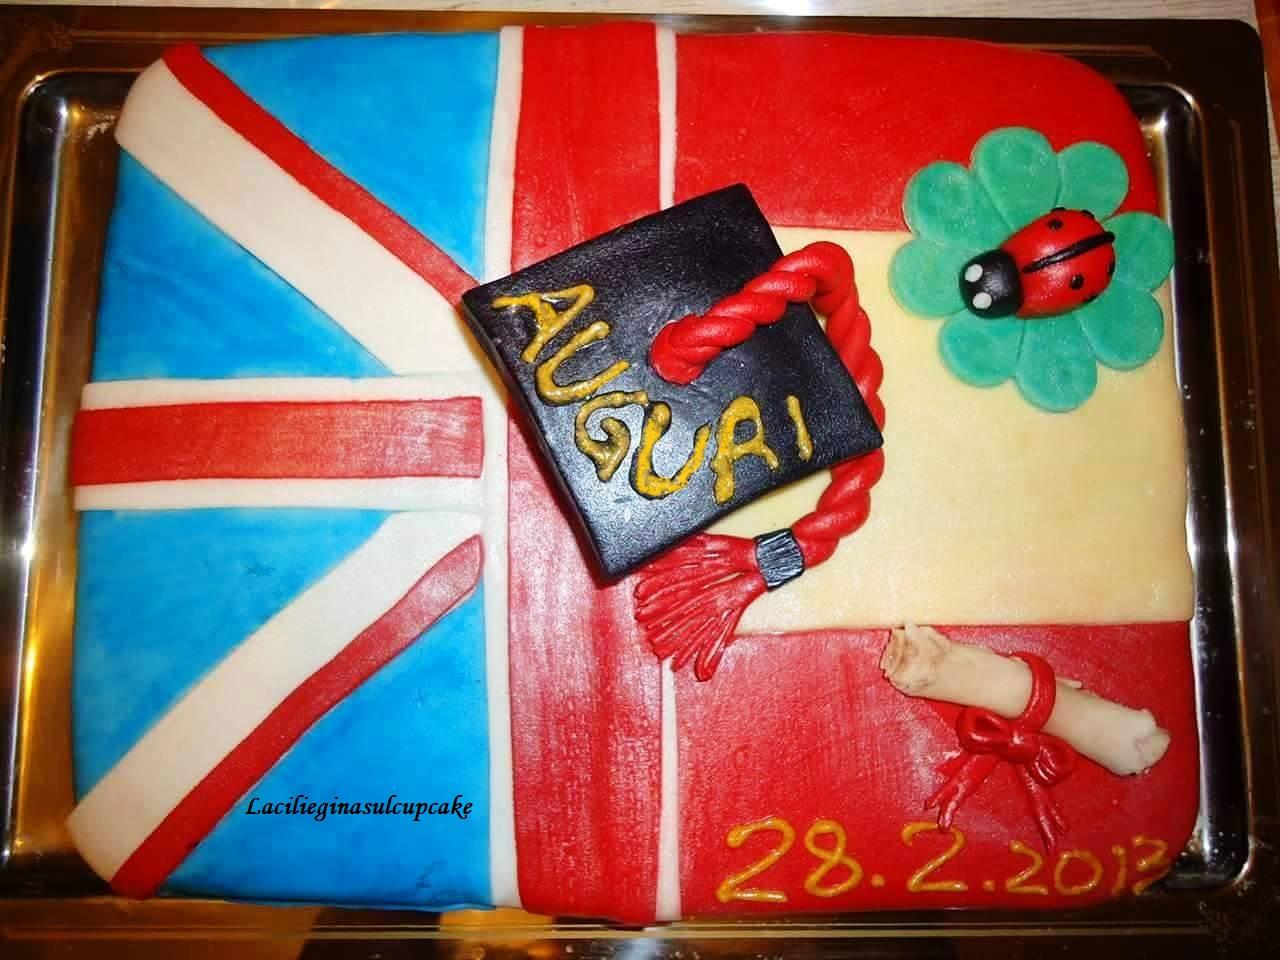 Lacilieginasulcupcake for Laurea in design